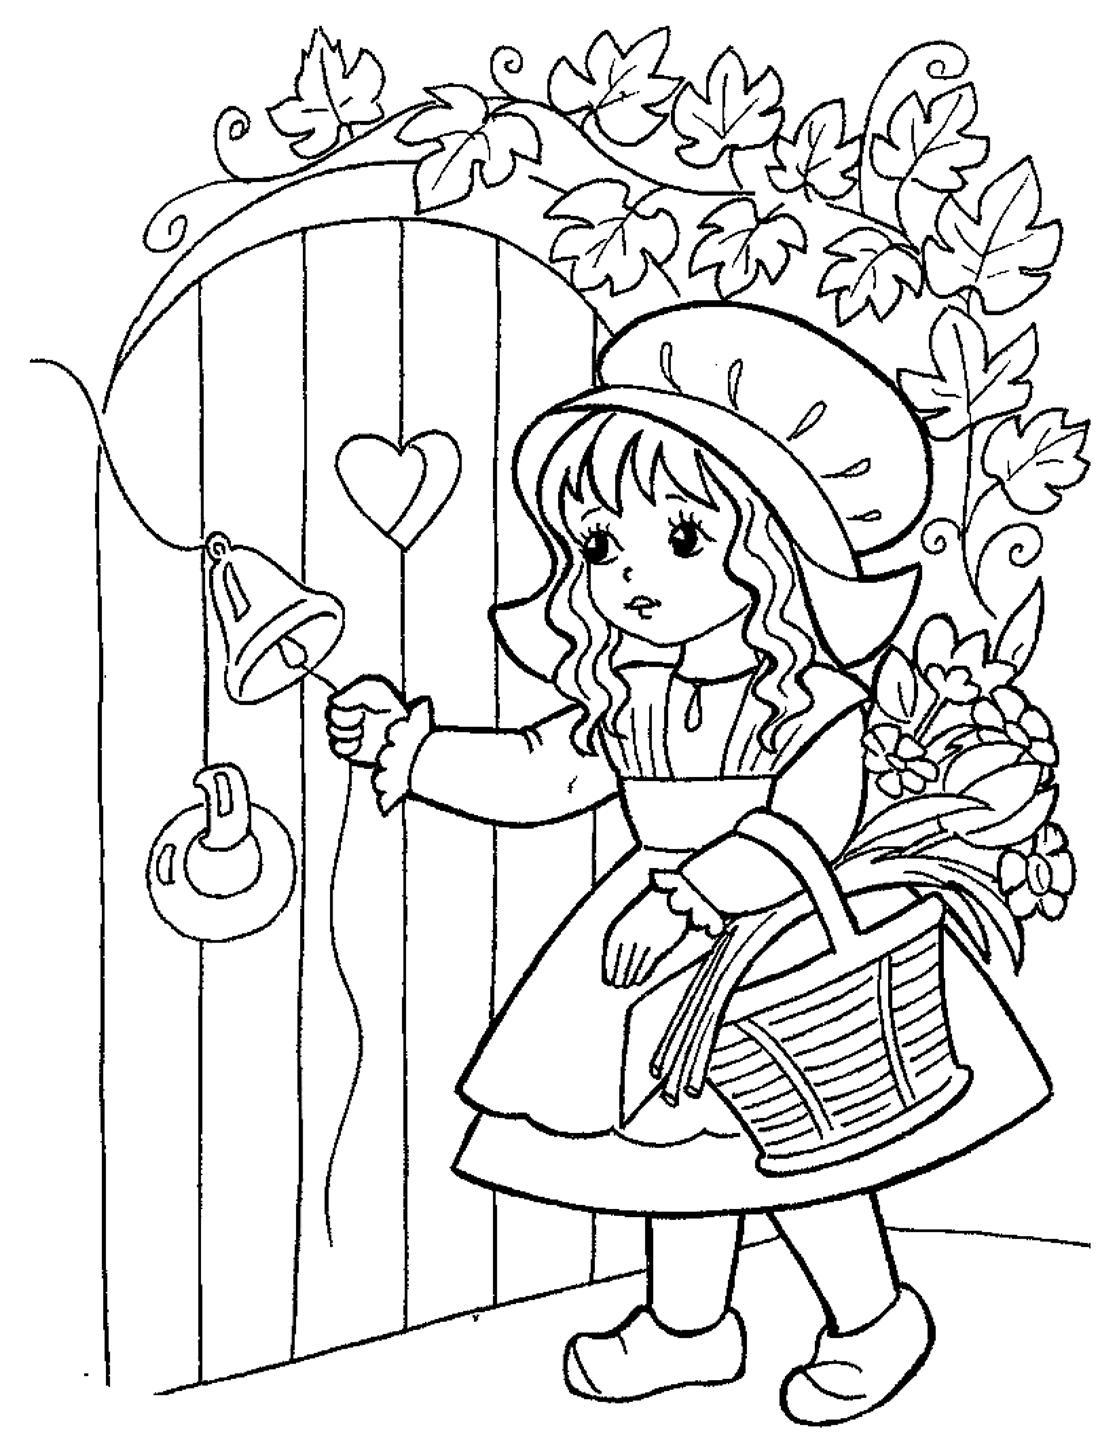 Раскраска Красная шапочка из сказки Шарля Перро